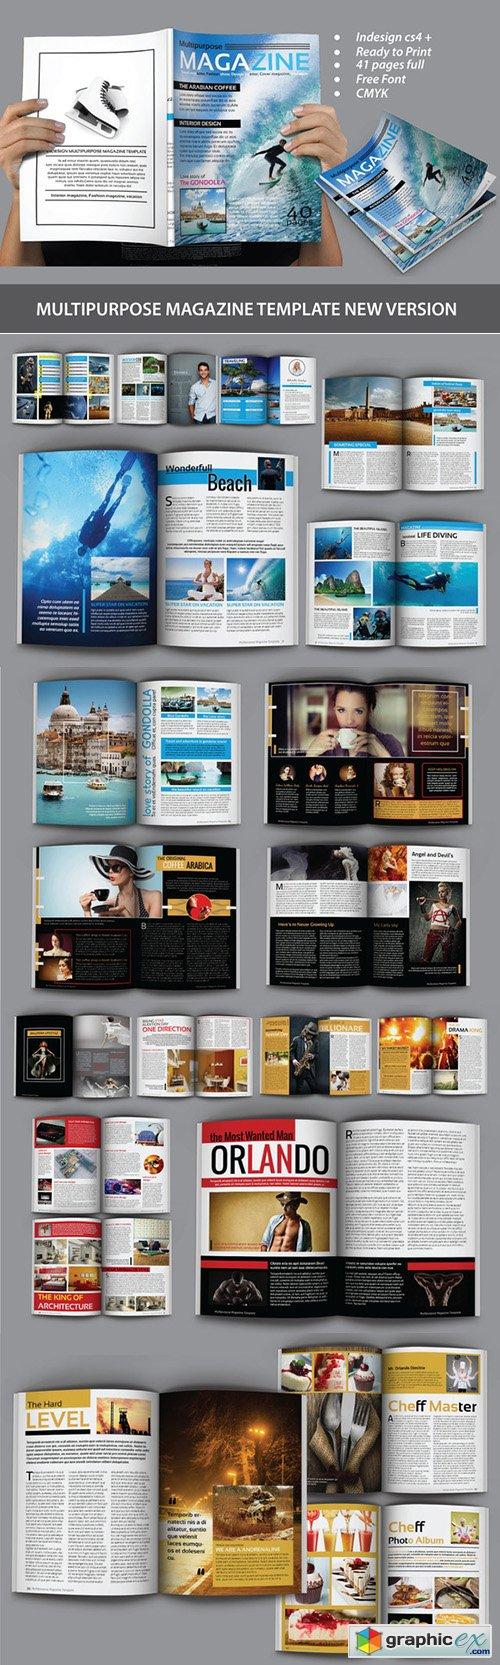 Multipurpose magazine template 268563 template pinterest multipurpose magazine template 268563 maxwellsz